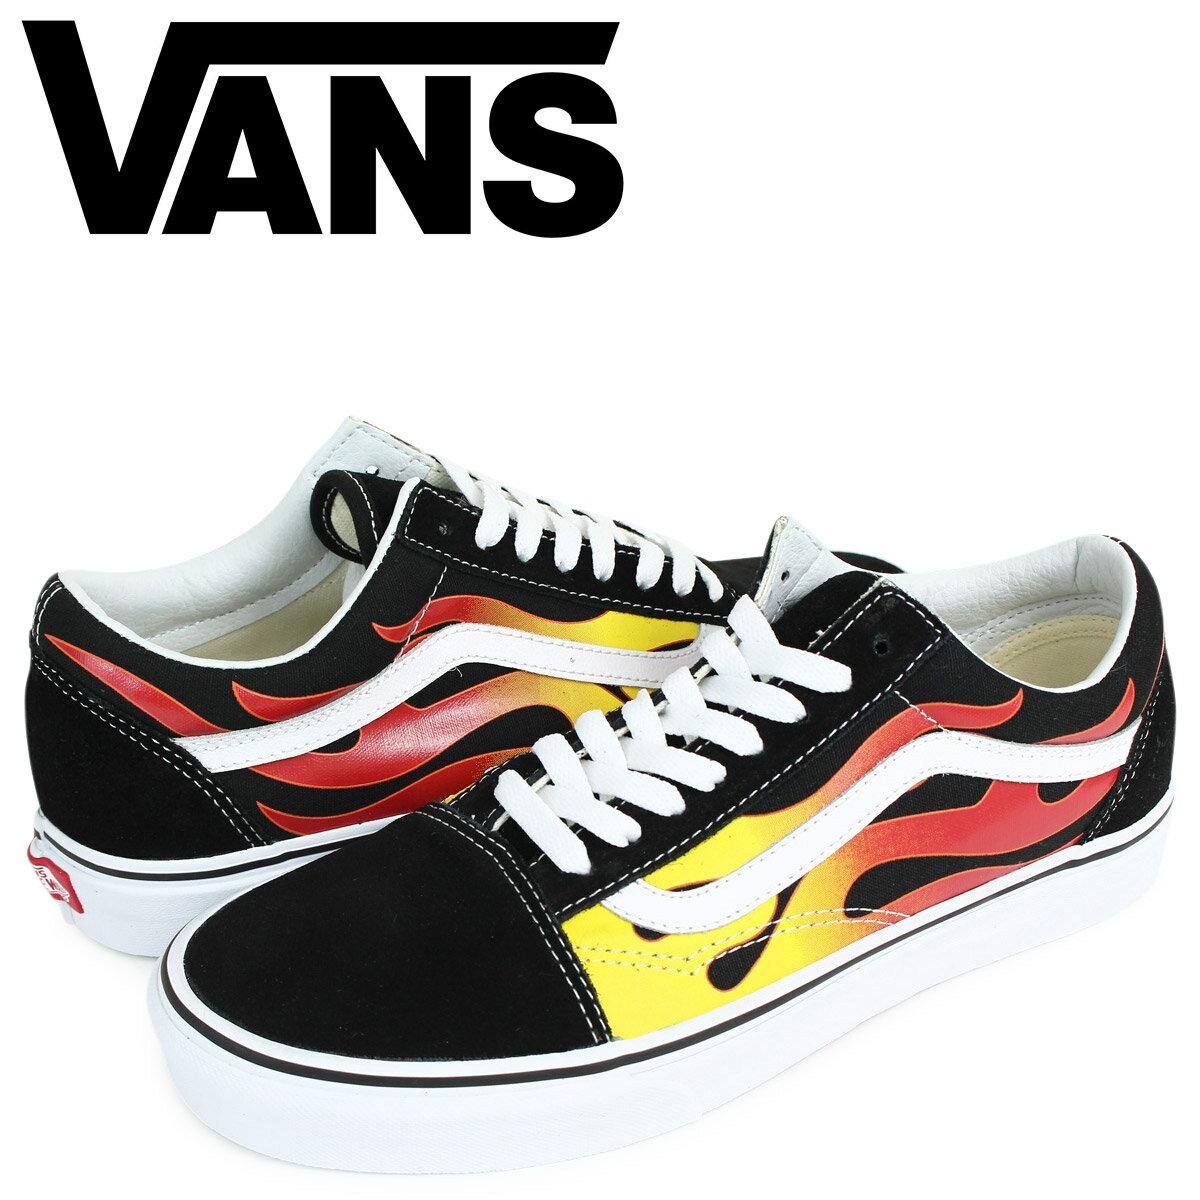 VANS オールドスクール スニーカー メンズ バンズ ヴァンズ OLD SKOOL VN0A38G1PHN 靴 ブラック 【10/30 新入荷】